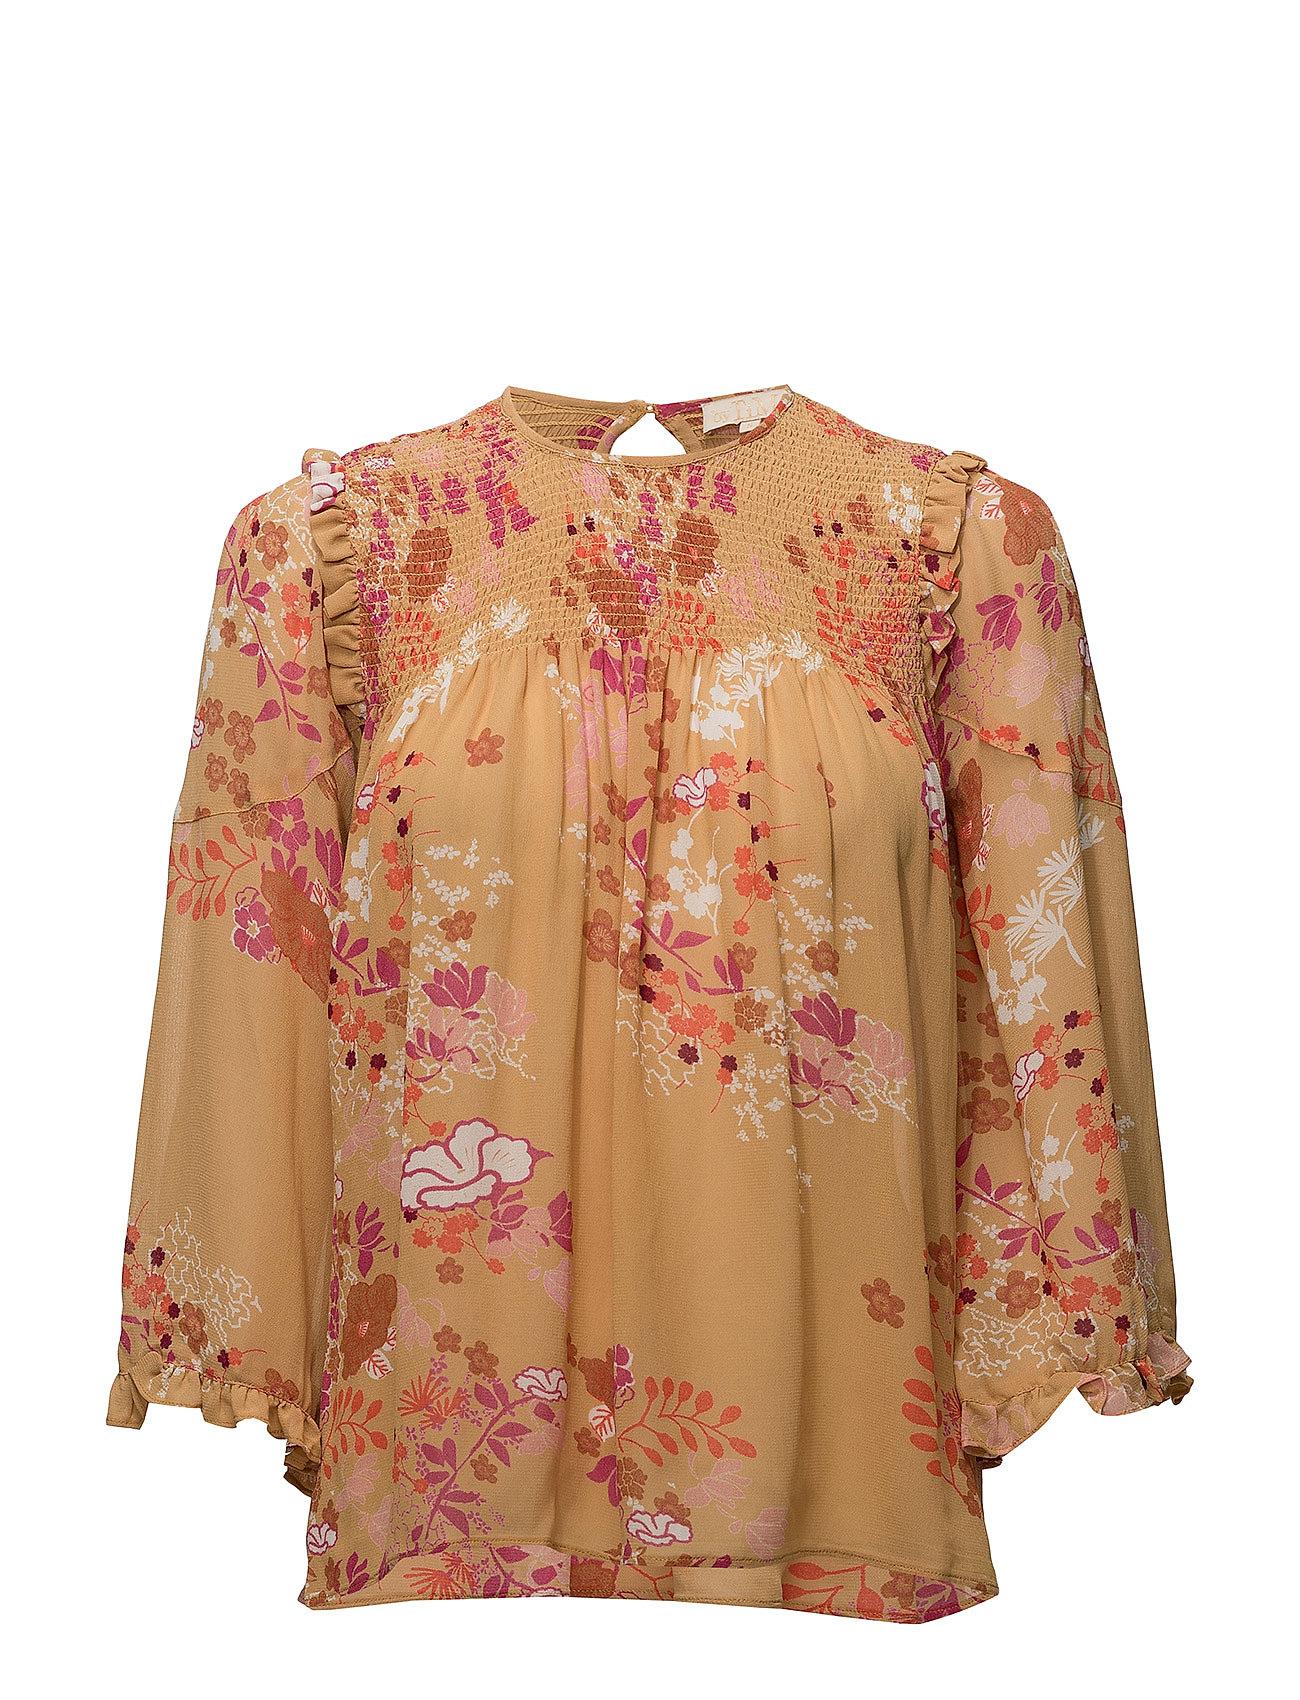 0ed0917e by Ti Mo Semi Couture Blouse (389 Golden Garden), (208.80 €) | Large ...